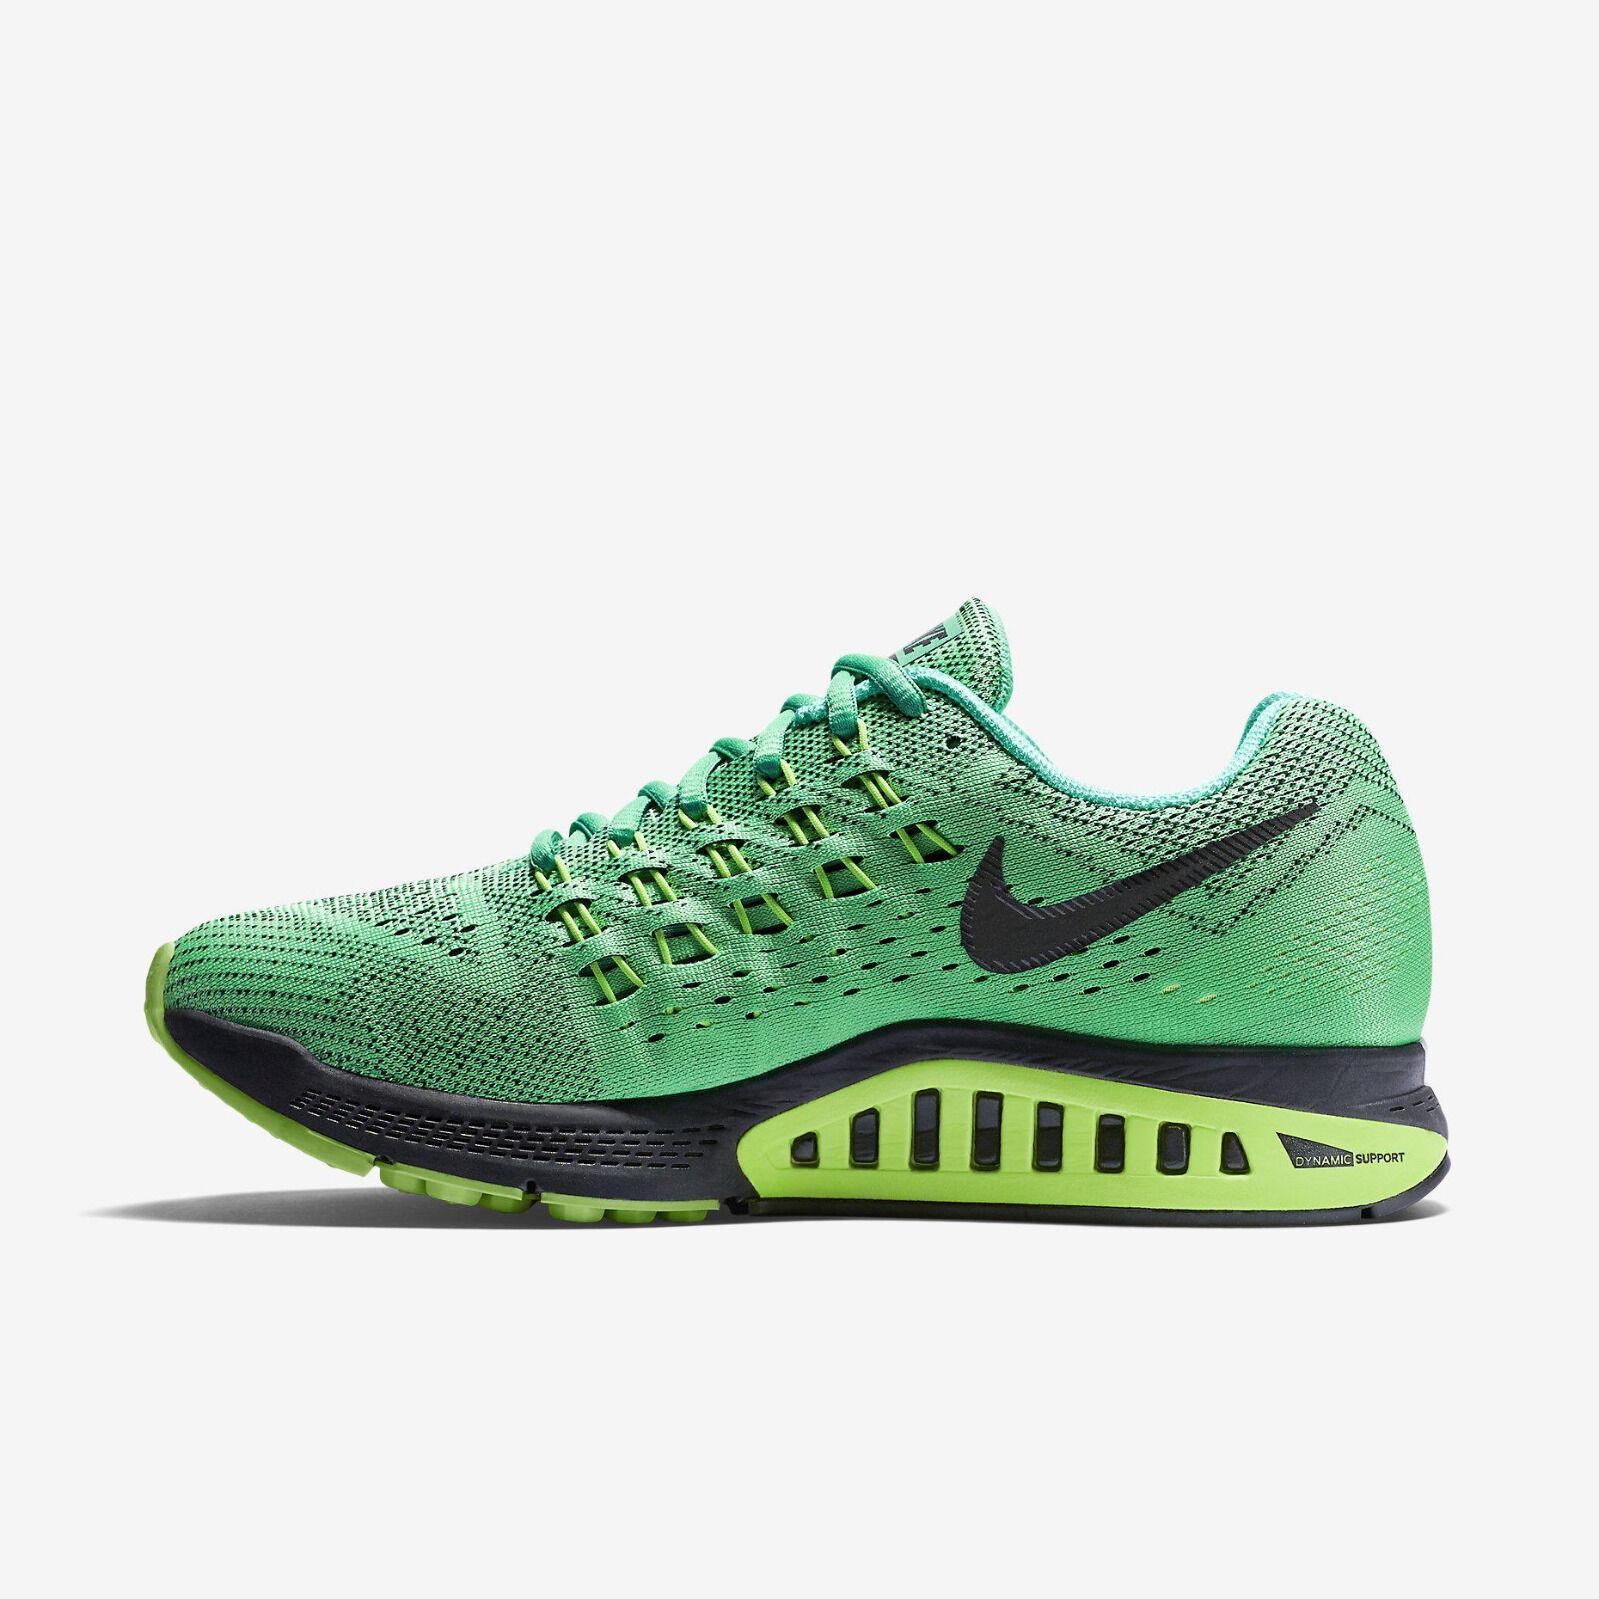 NUOVO Autentico Nike Air Zoom Structure 18 EU Verde Scarpe Da Corsa EU 18 36.5 US 6 a38750